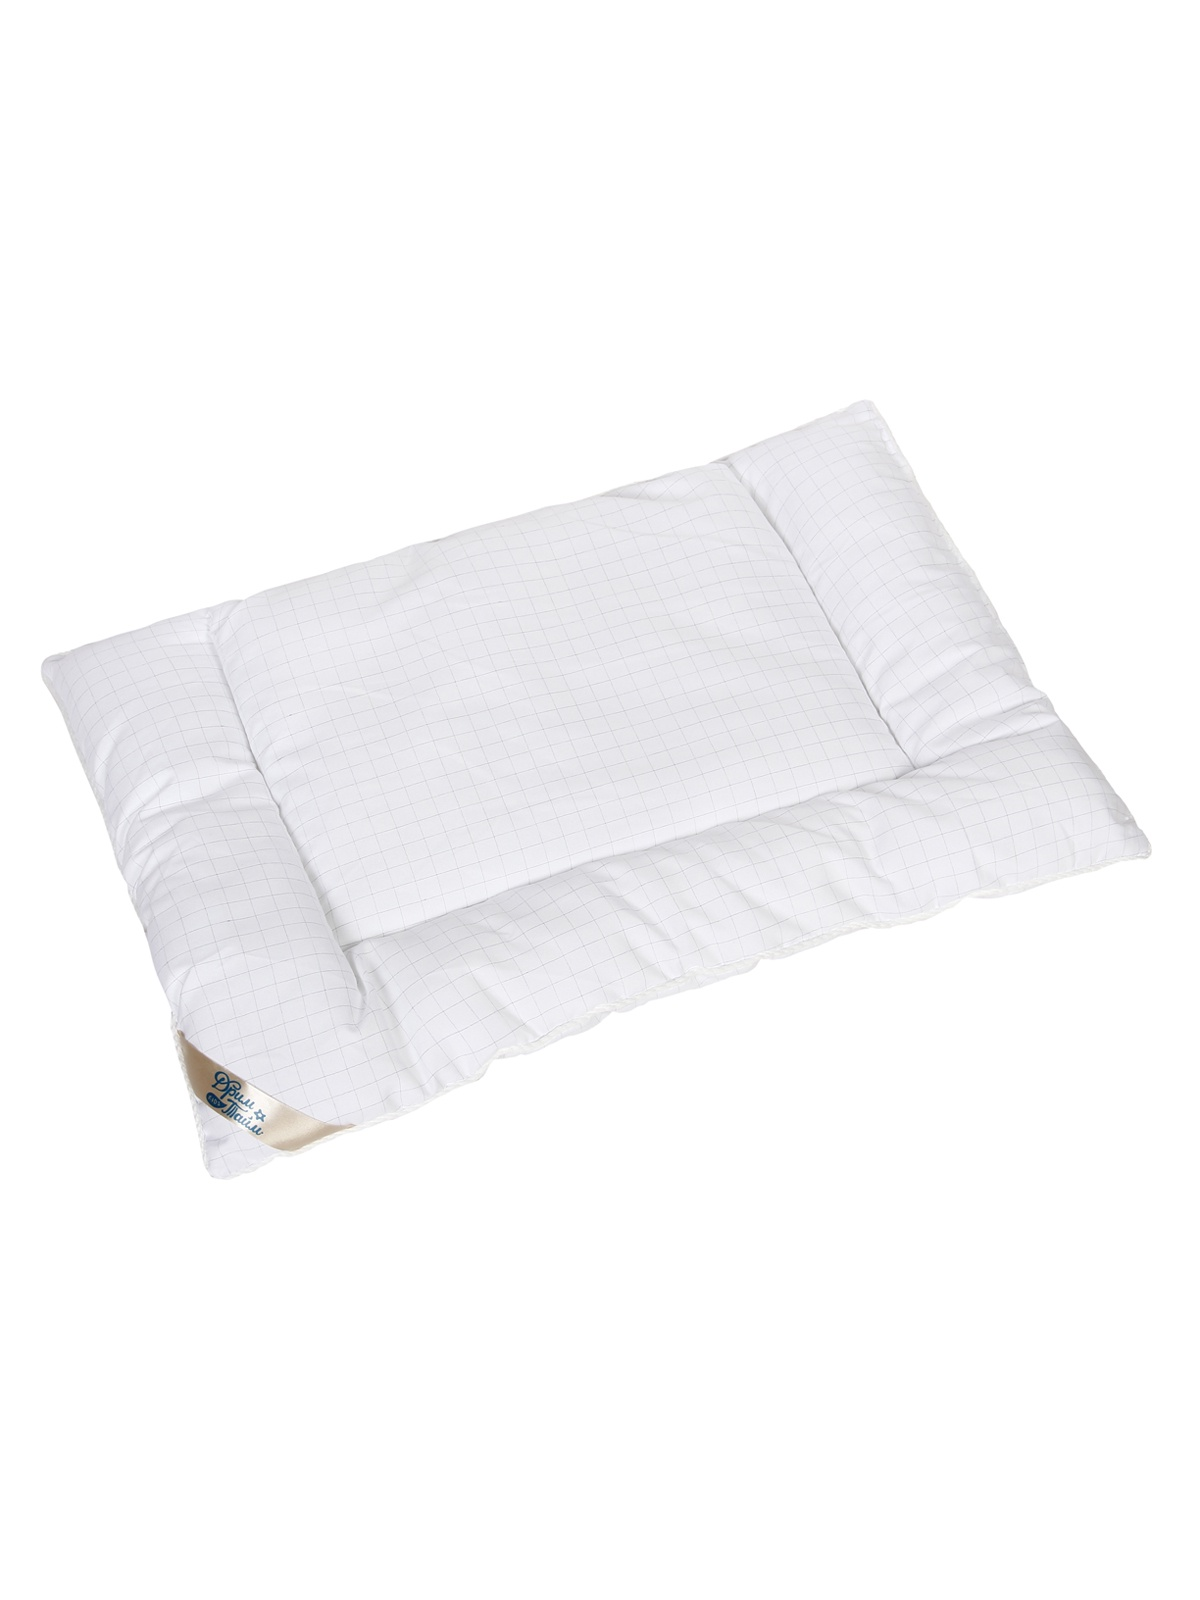 Подушка Dream time, ДТ-ОК-04060, 40Х60 см